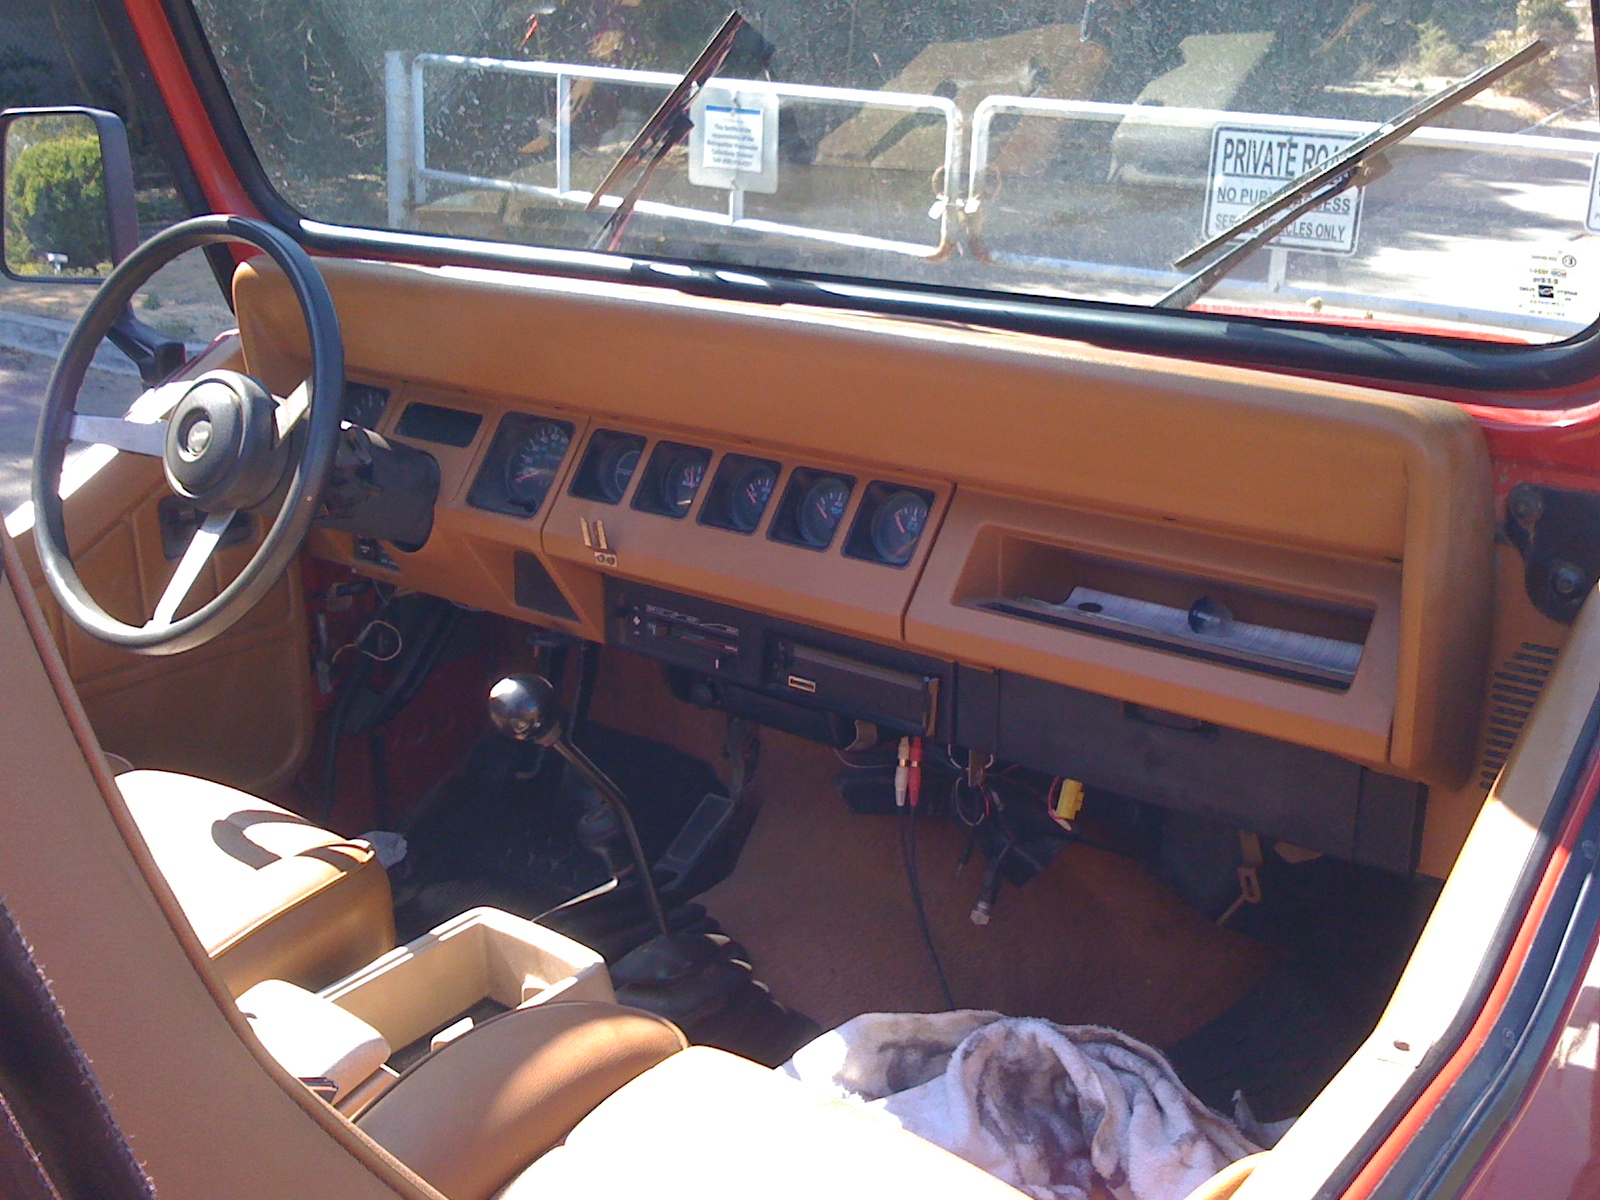 1993 jeep wrangler information and photos zombiedrive for Interior wrangler yj